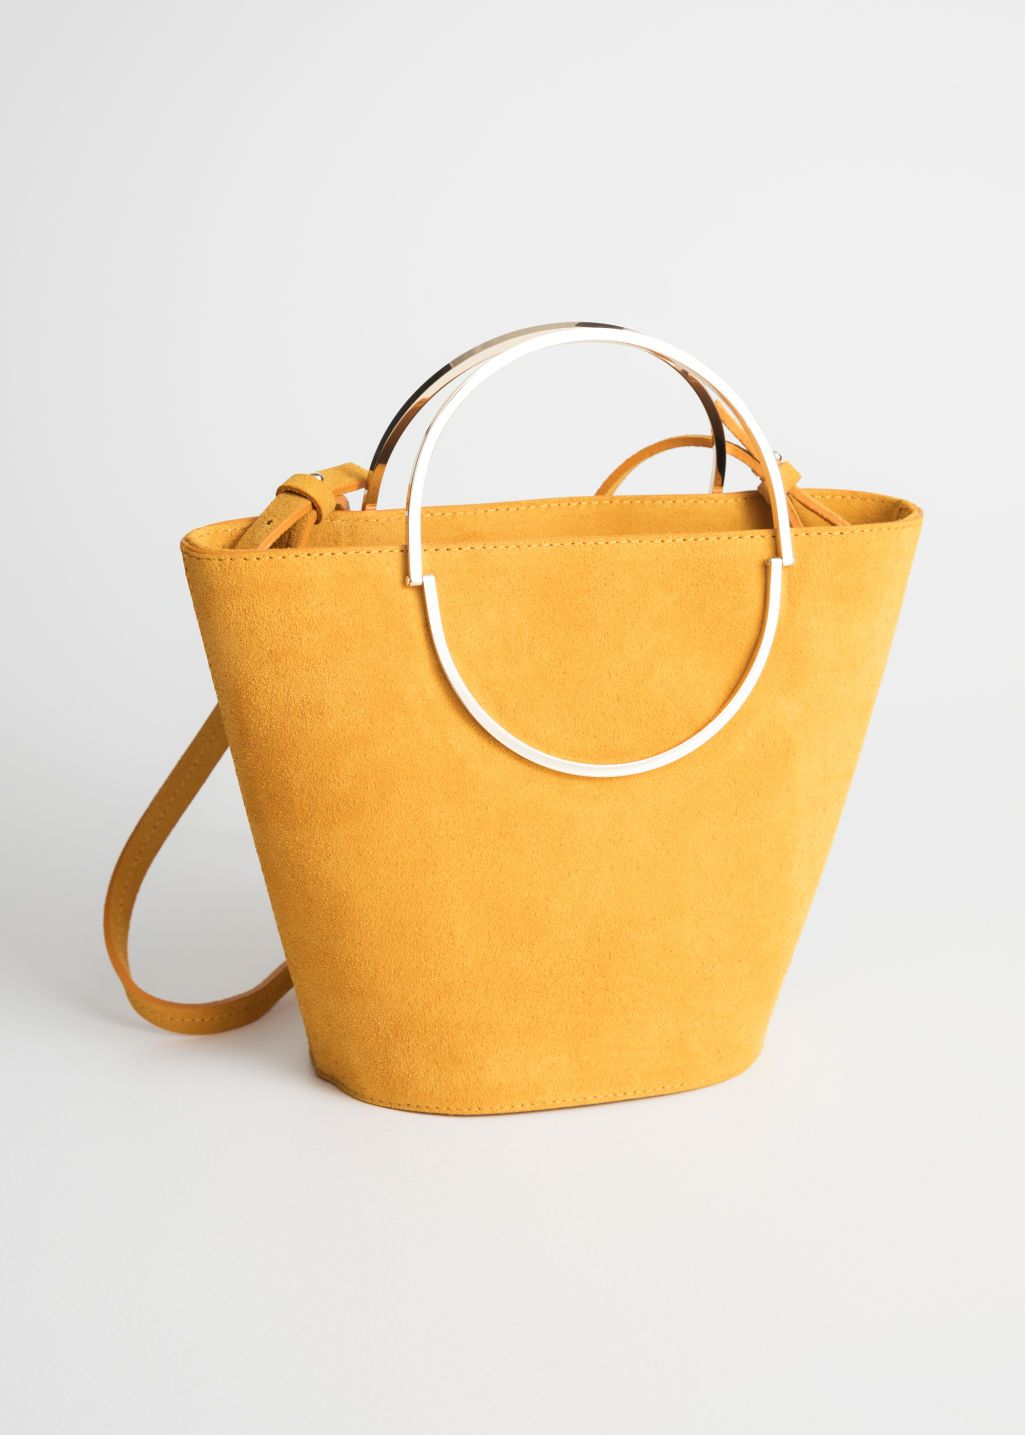 04bfaac8c Suede Bucket Bag in 2019 | W i s h l i s t | Bags, Bucket Bag, Bucket